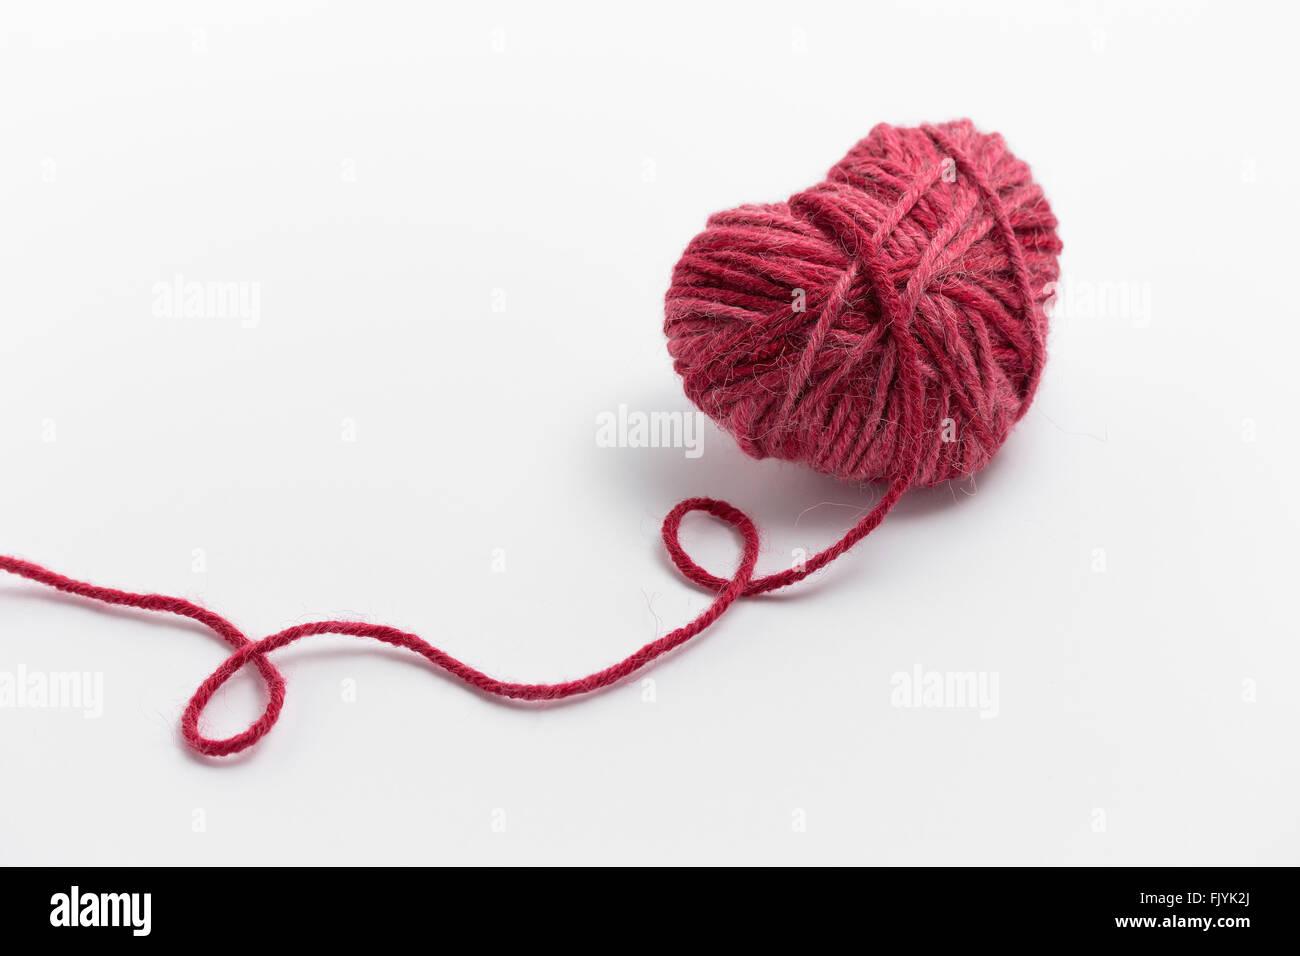 Pink Crochet Background Yarn Heart Imágenes De Stock & Pink Crochet ...